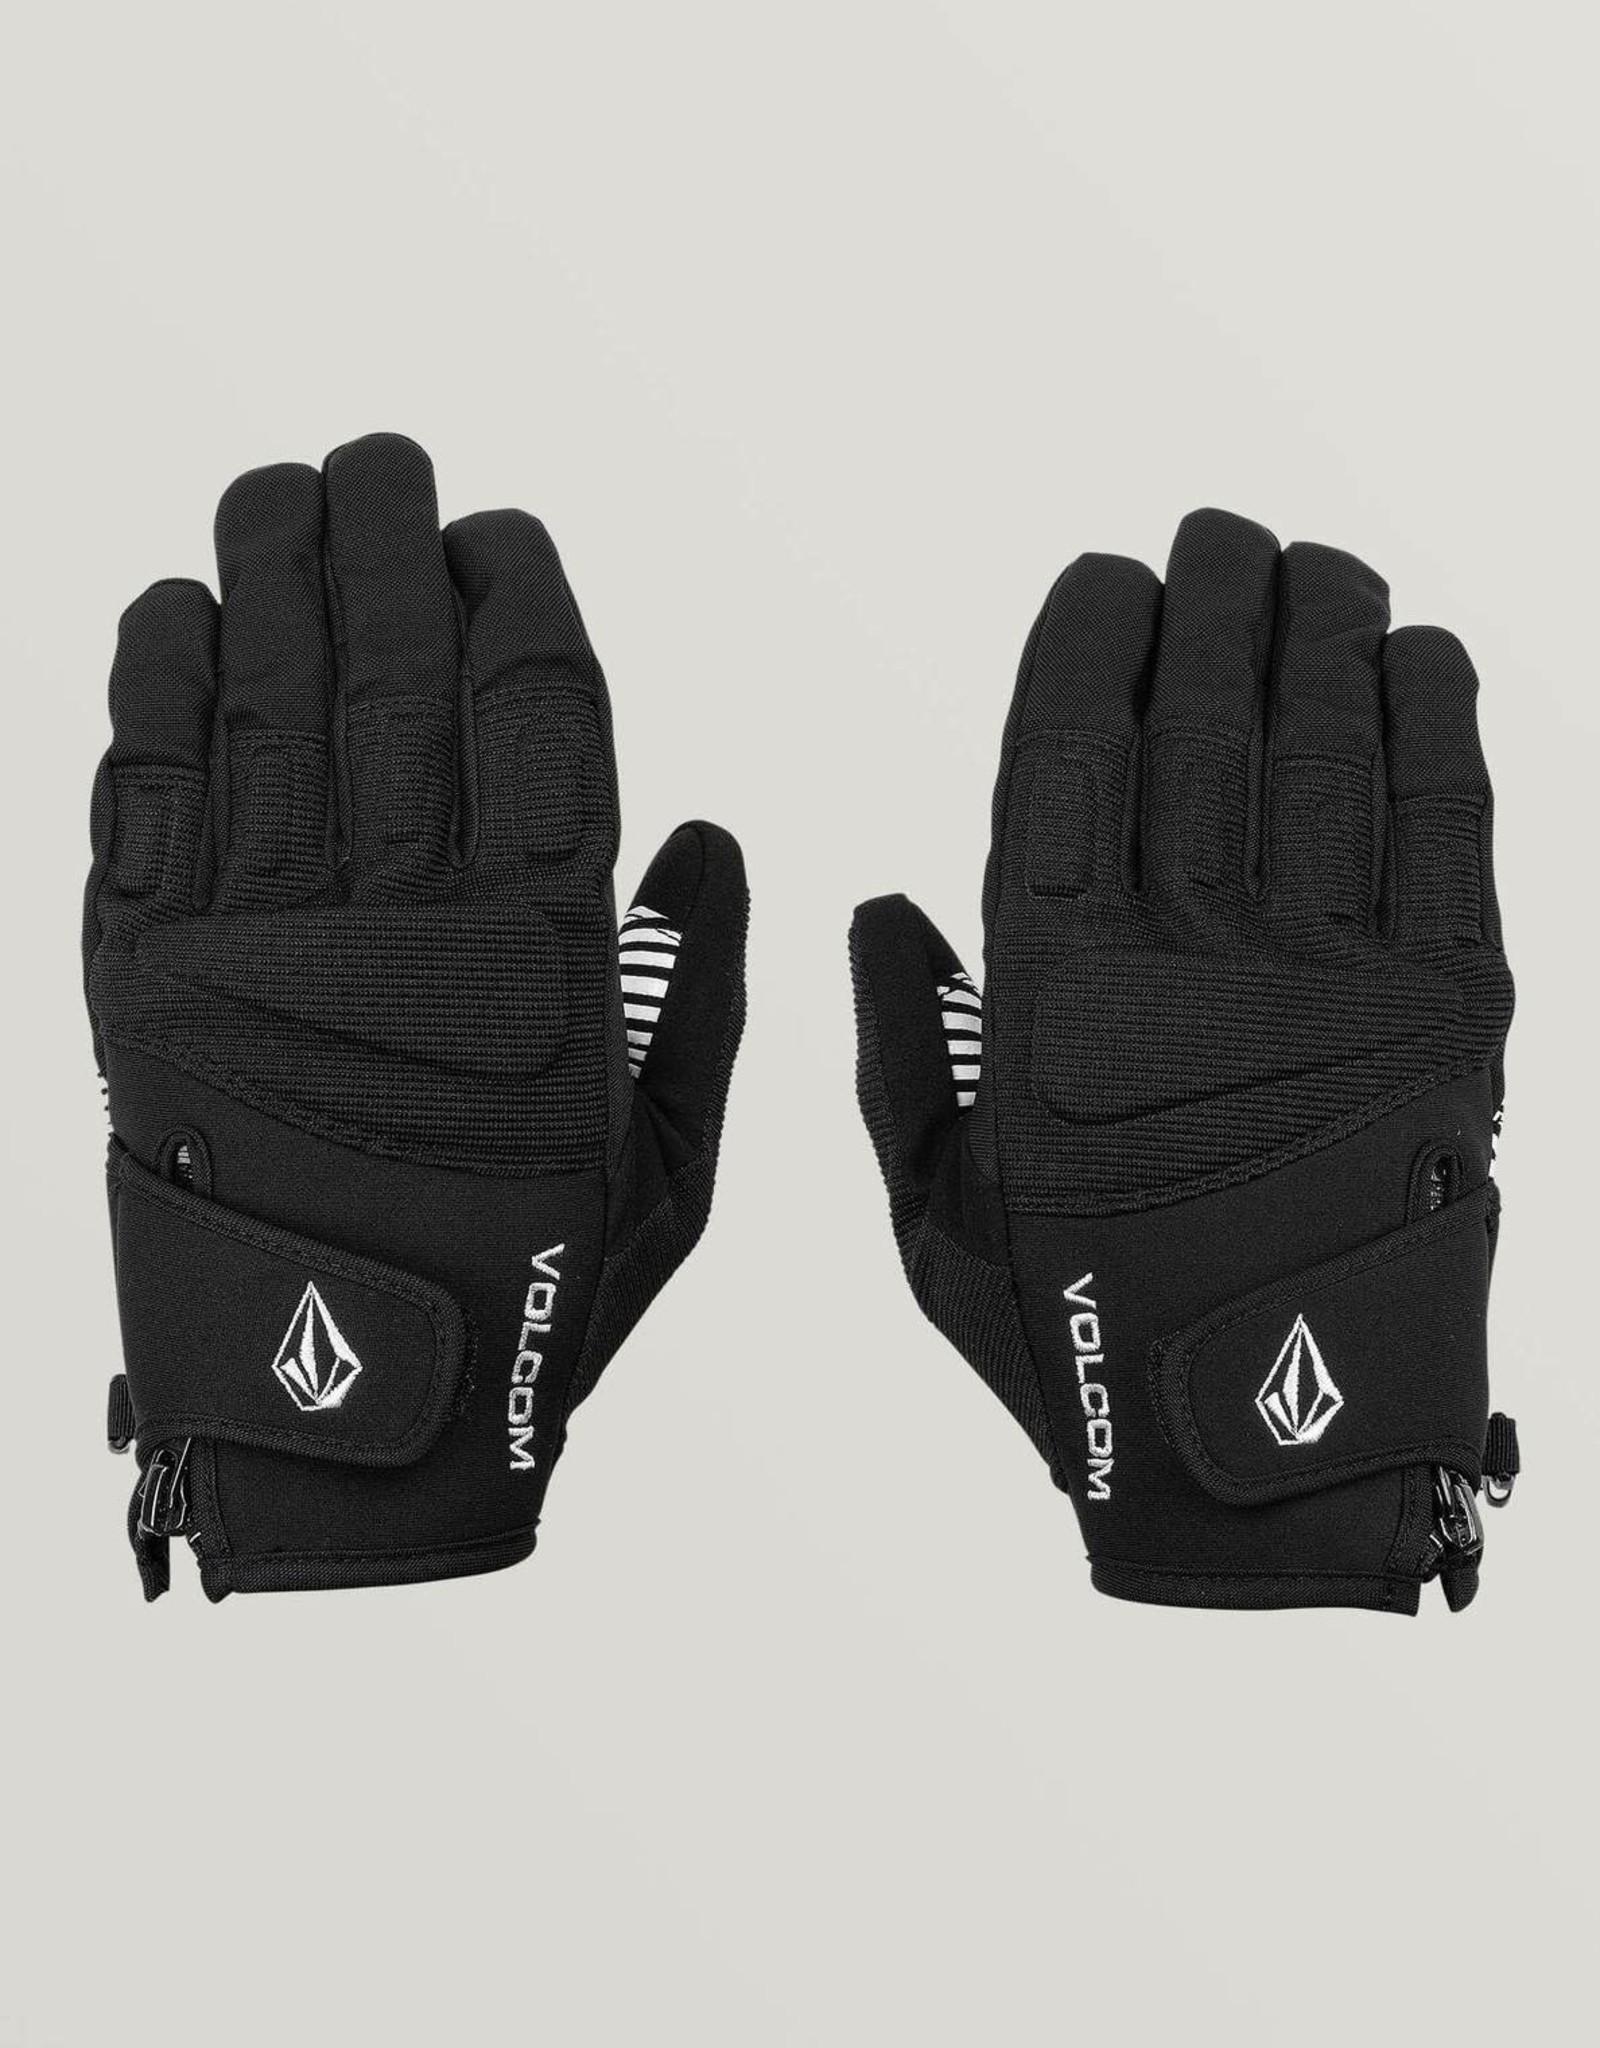 Volcom Volcom Crail Glove Black